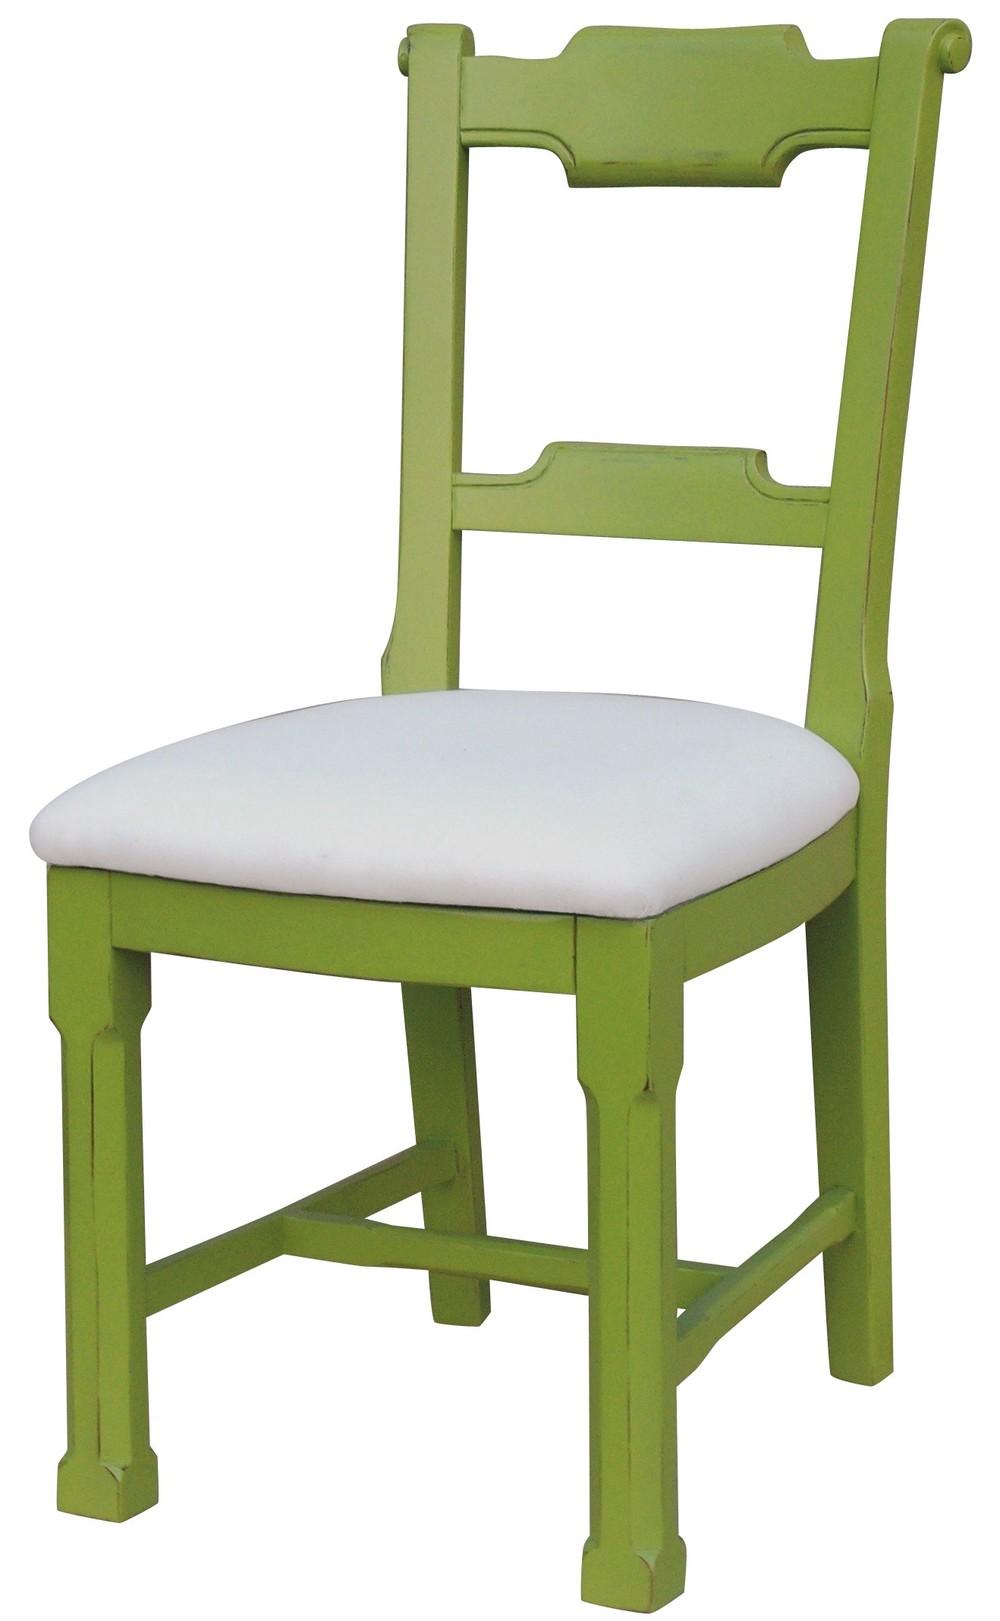 Trade Winds Furniture - Harborton Side Chair